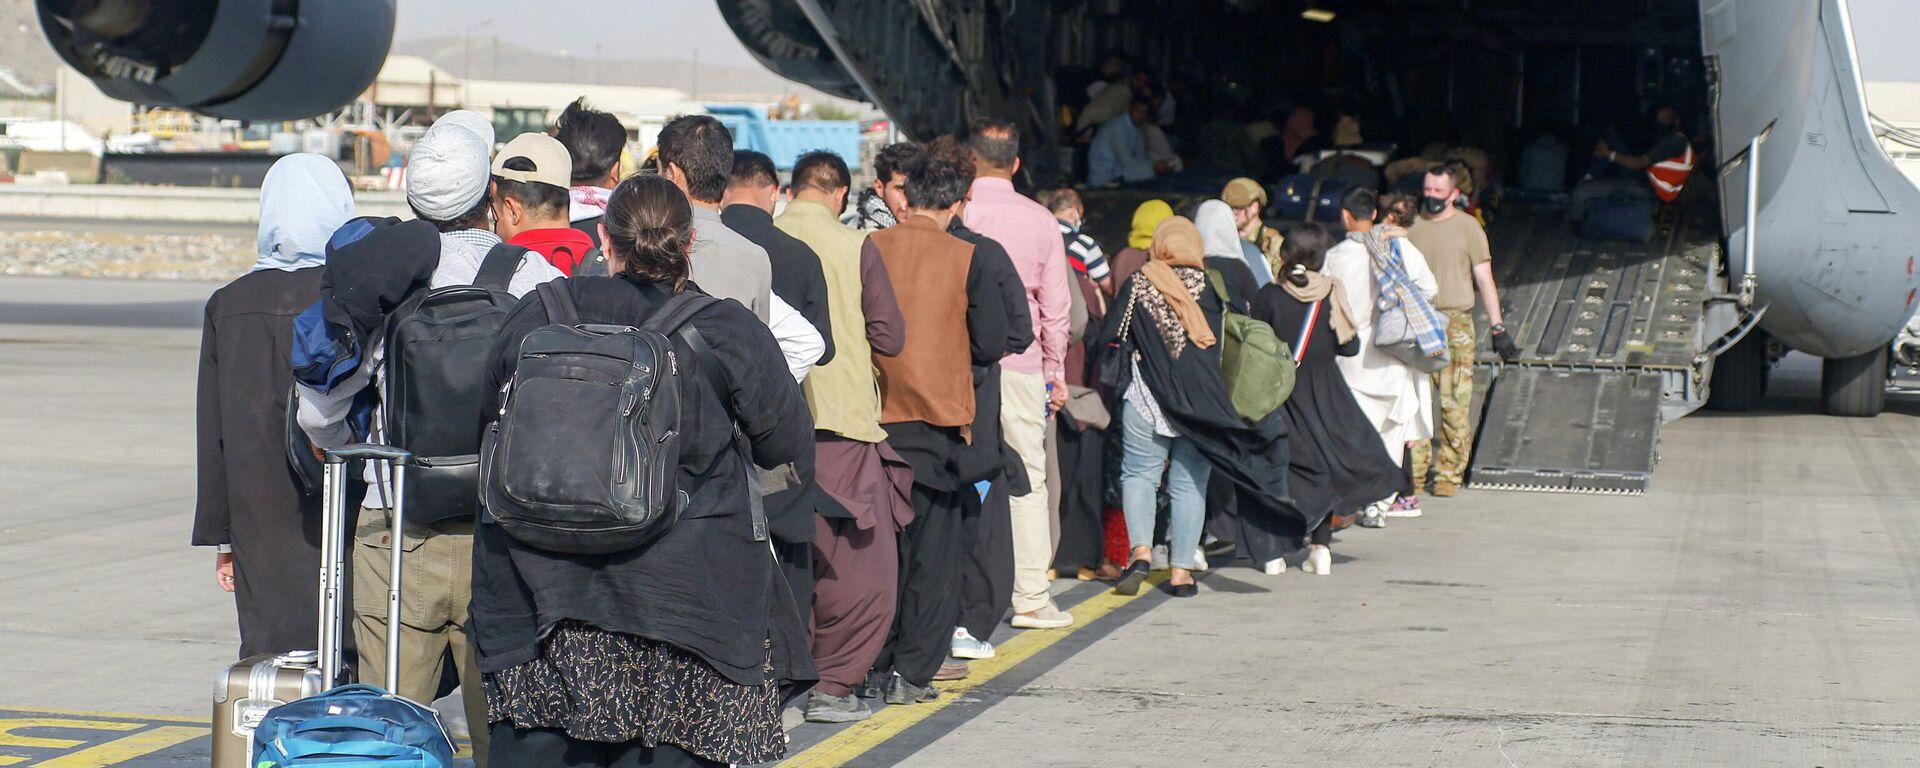 Las evacuaciones en Kabul, Afganistán - Sputnik Mundo, 1920, 25.08.2021